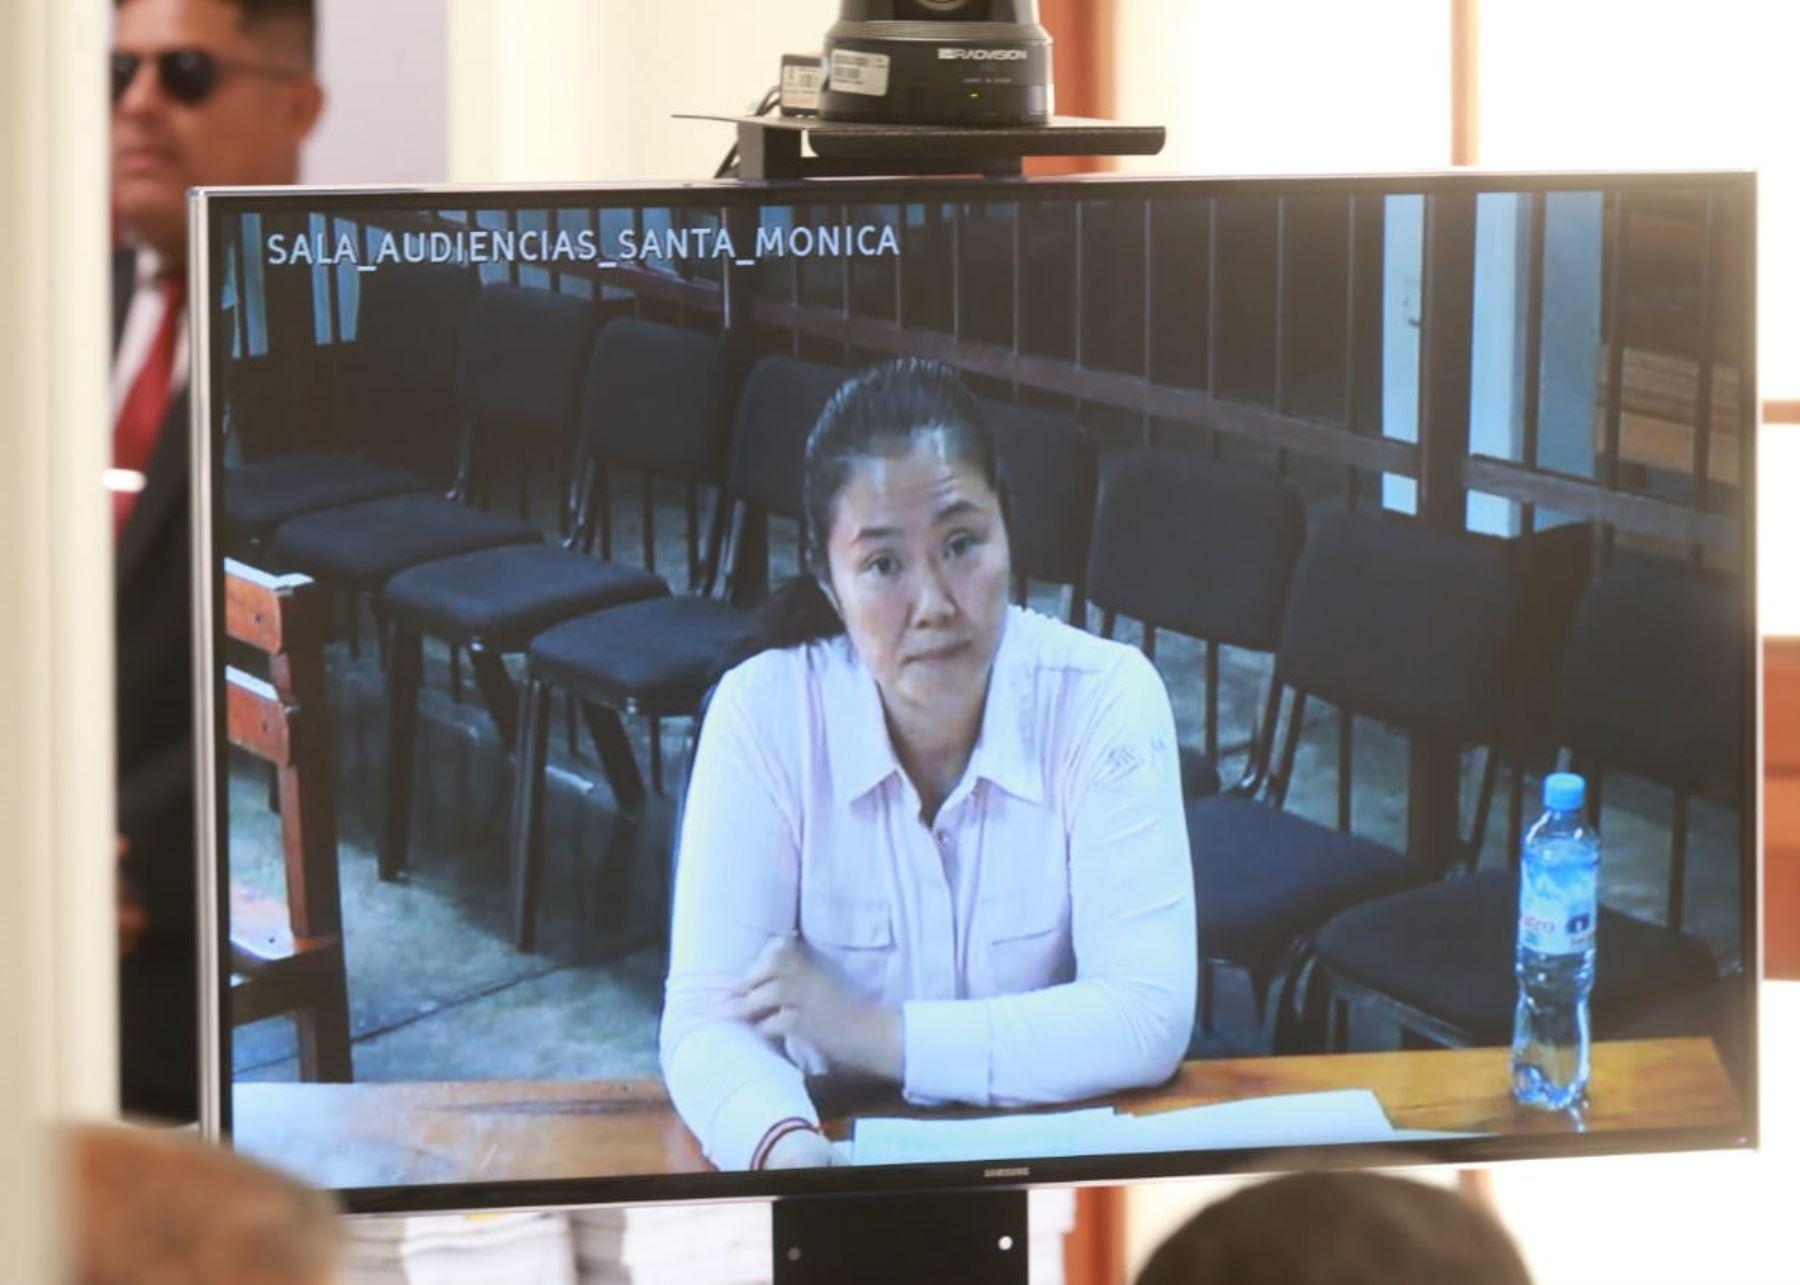 Juez peruano que resolverá libertad de Keiko Fujimori se